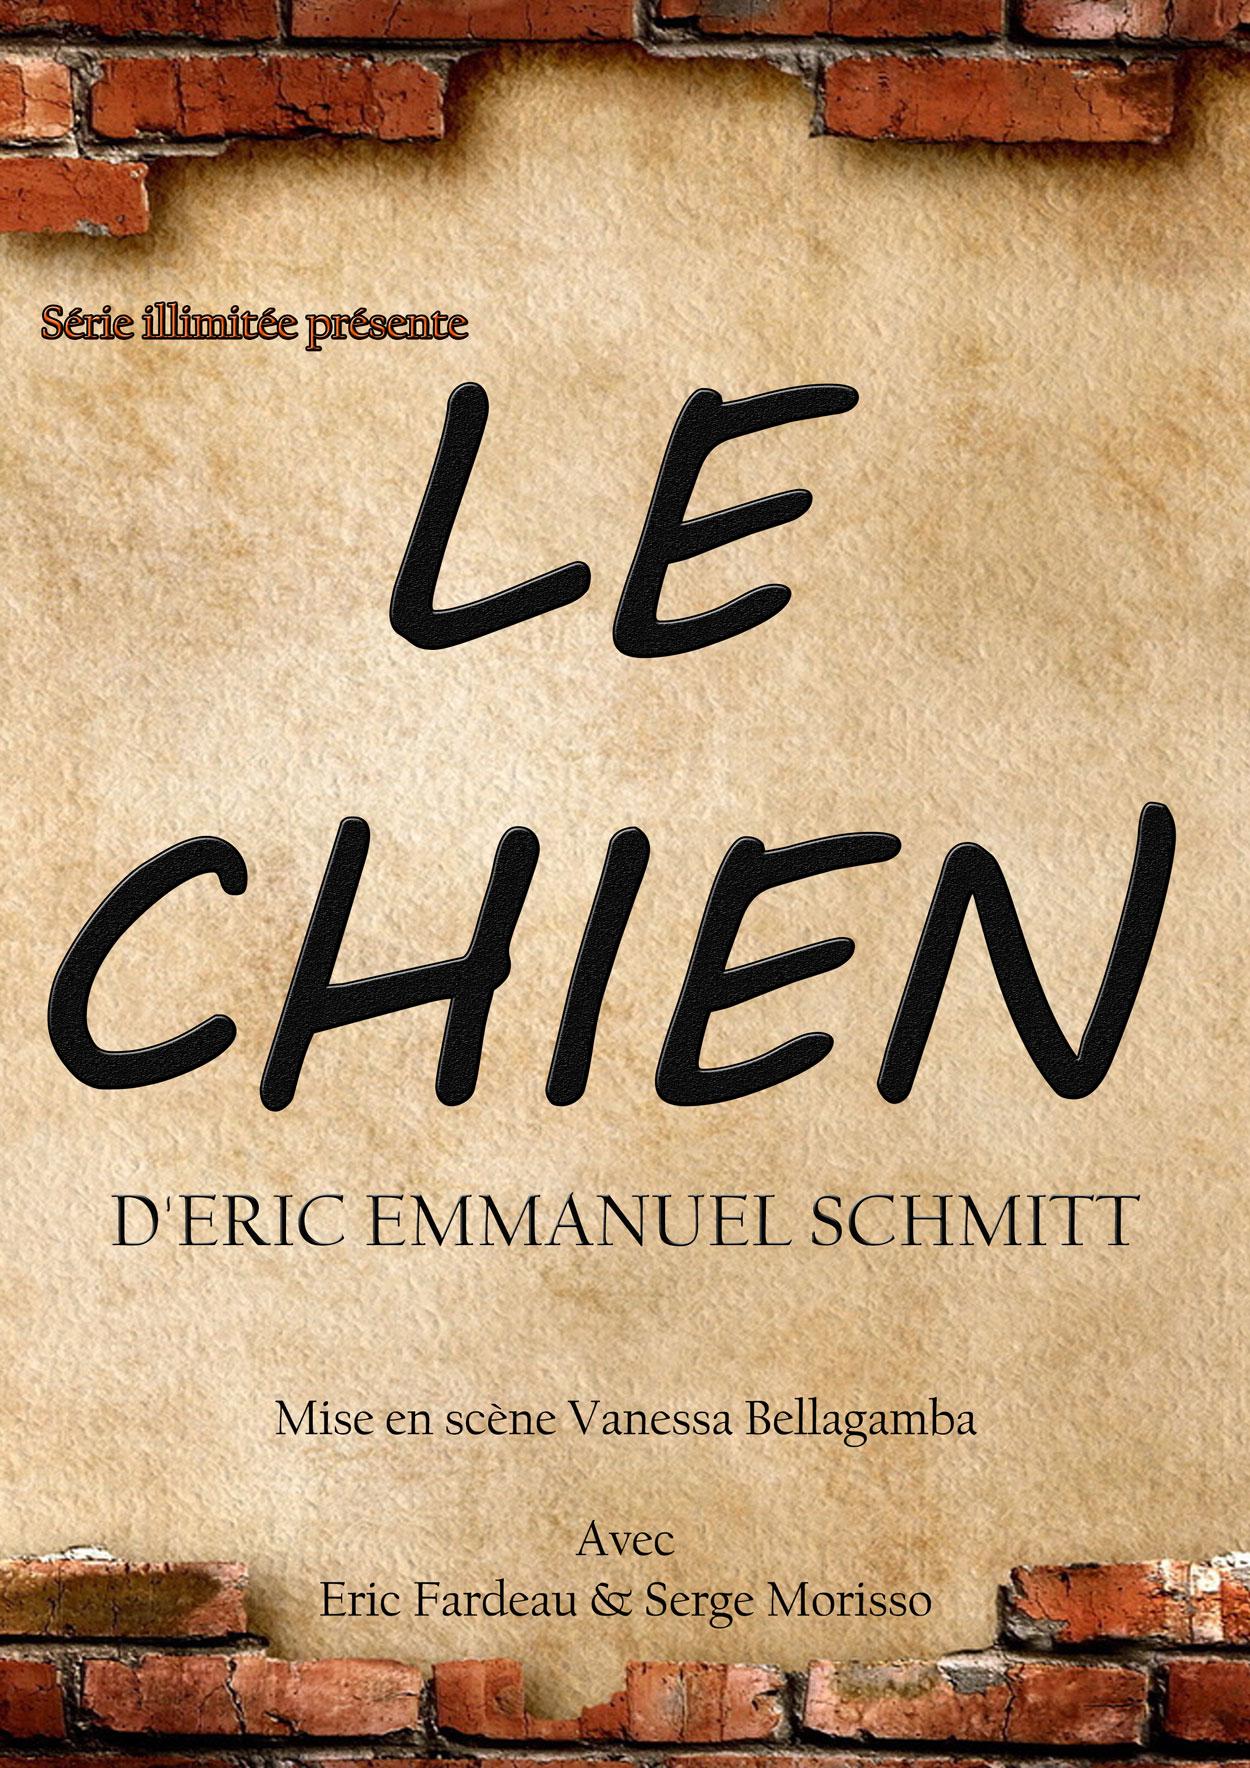 LE CHIEN D'ERIC EMANUEL SCHMITT NICE